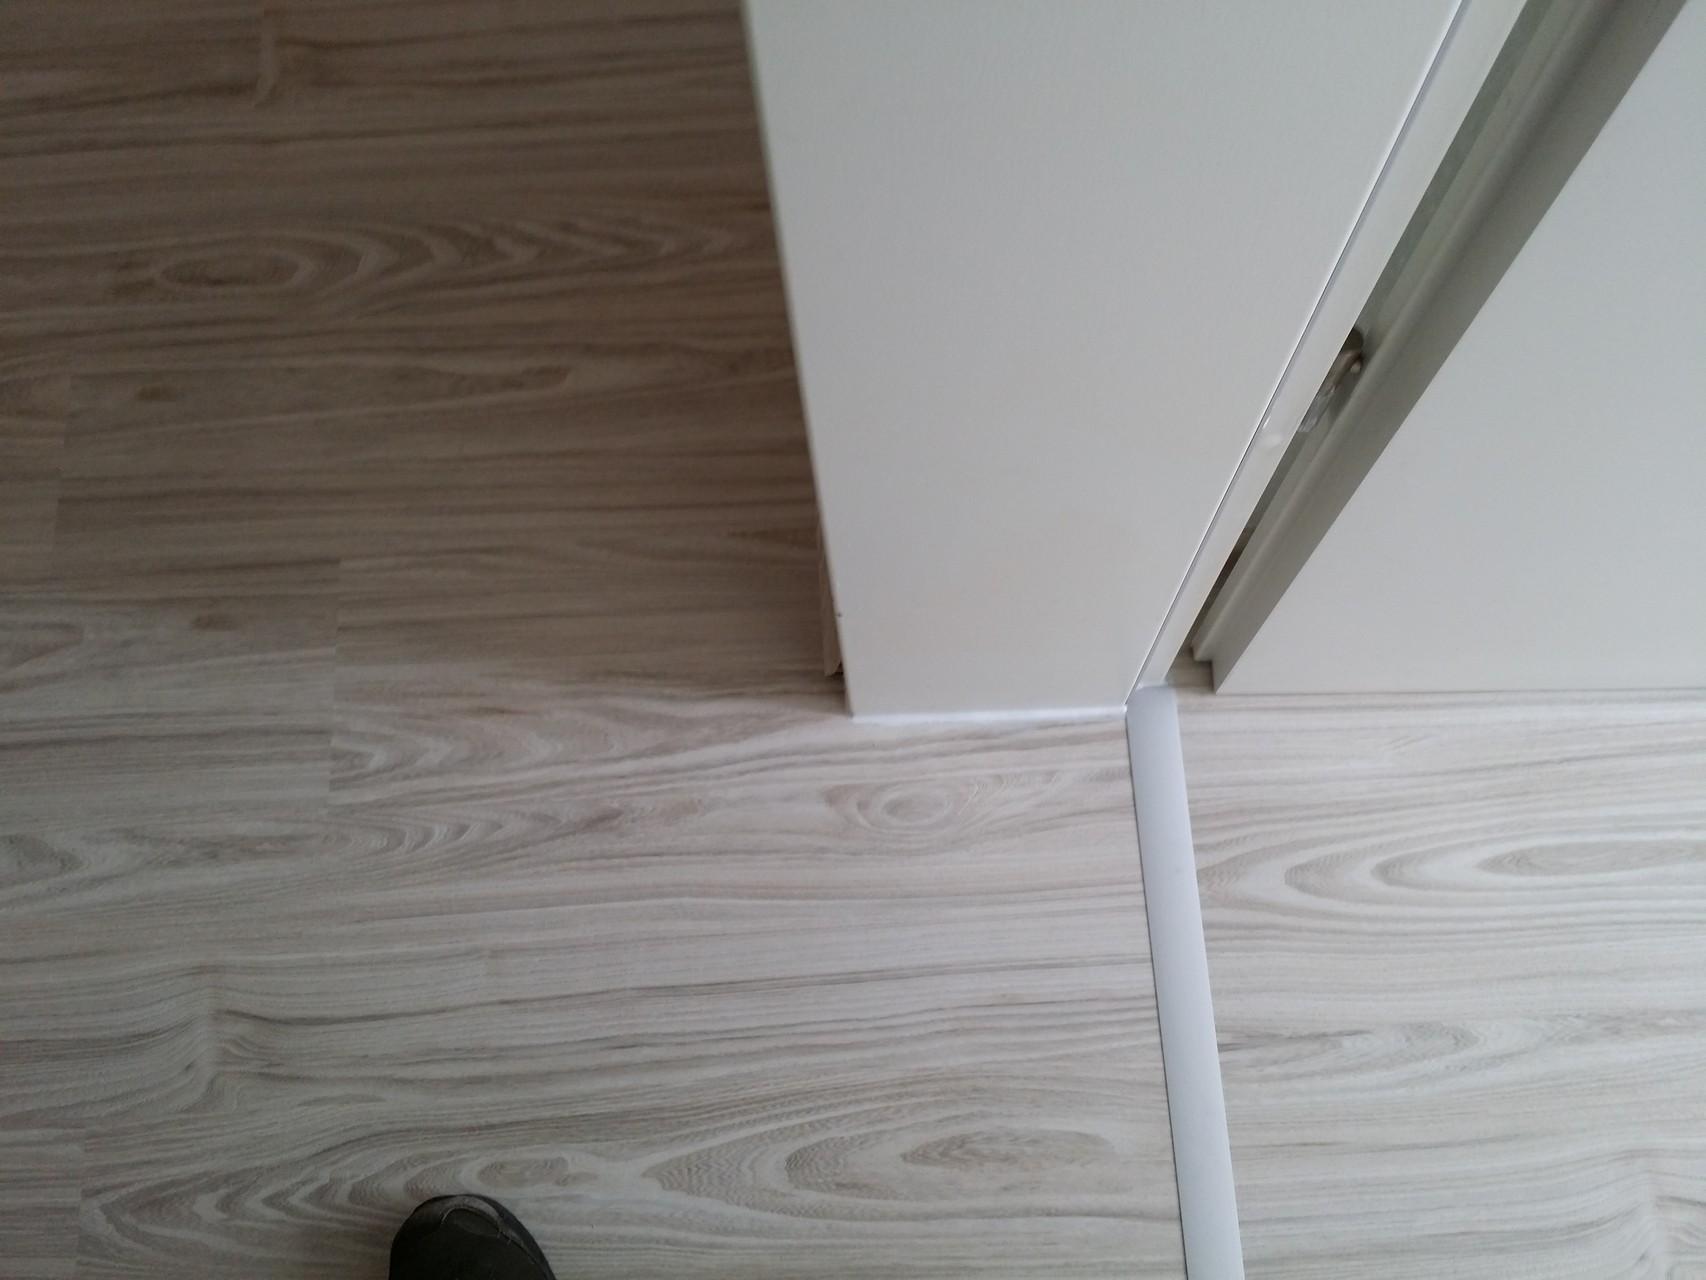 laminat ohne sockelleiste verlegen wohn design. Black Bedroom Furniture Sets. Home Design Ideas